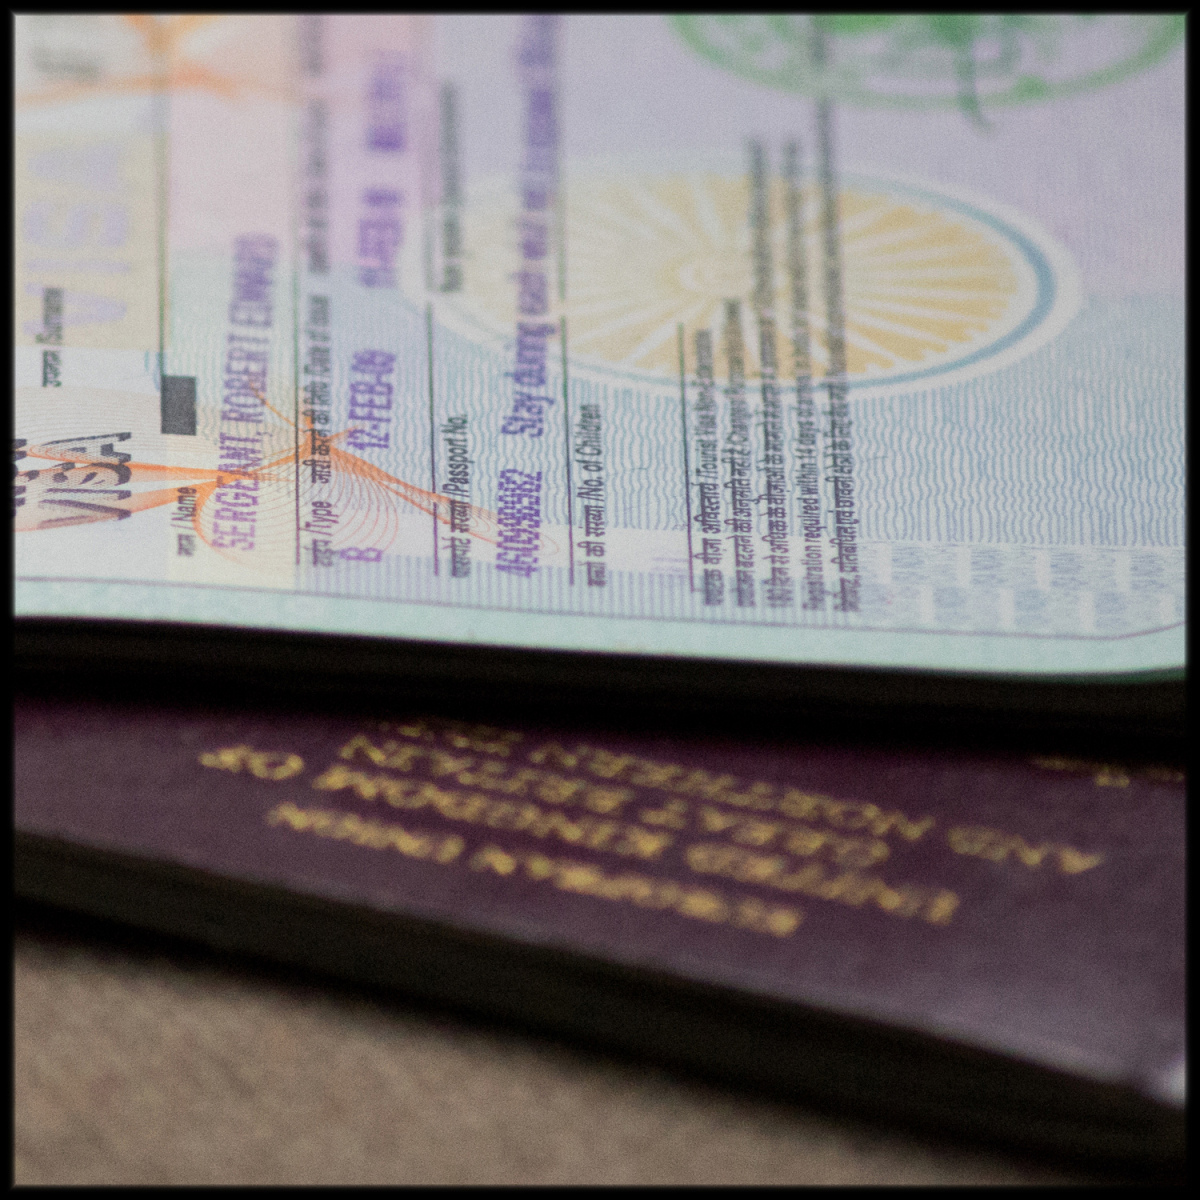 Sandra-Sergeant-Photography-Basingstoke-Passport-Photographs-Travel-Documents3